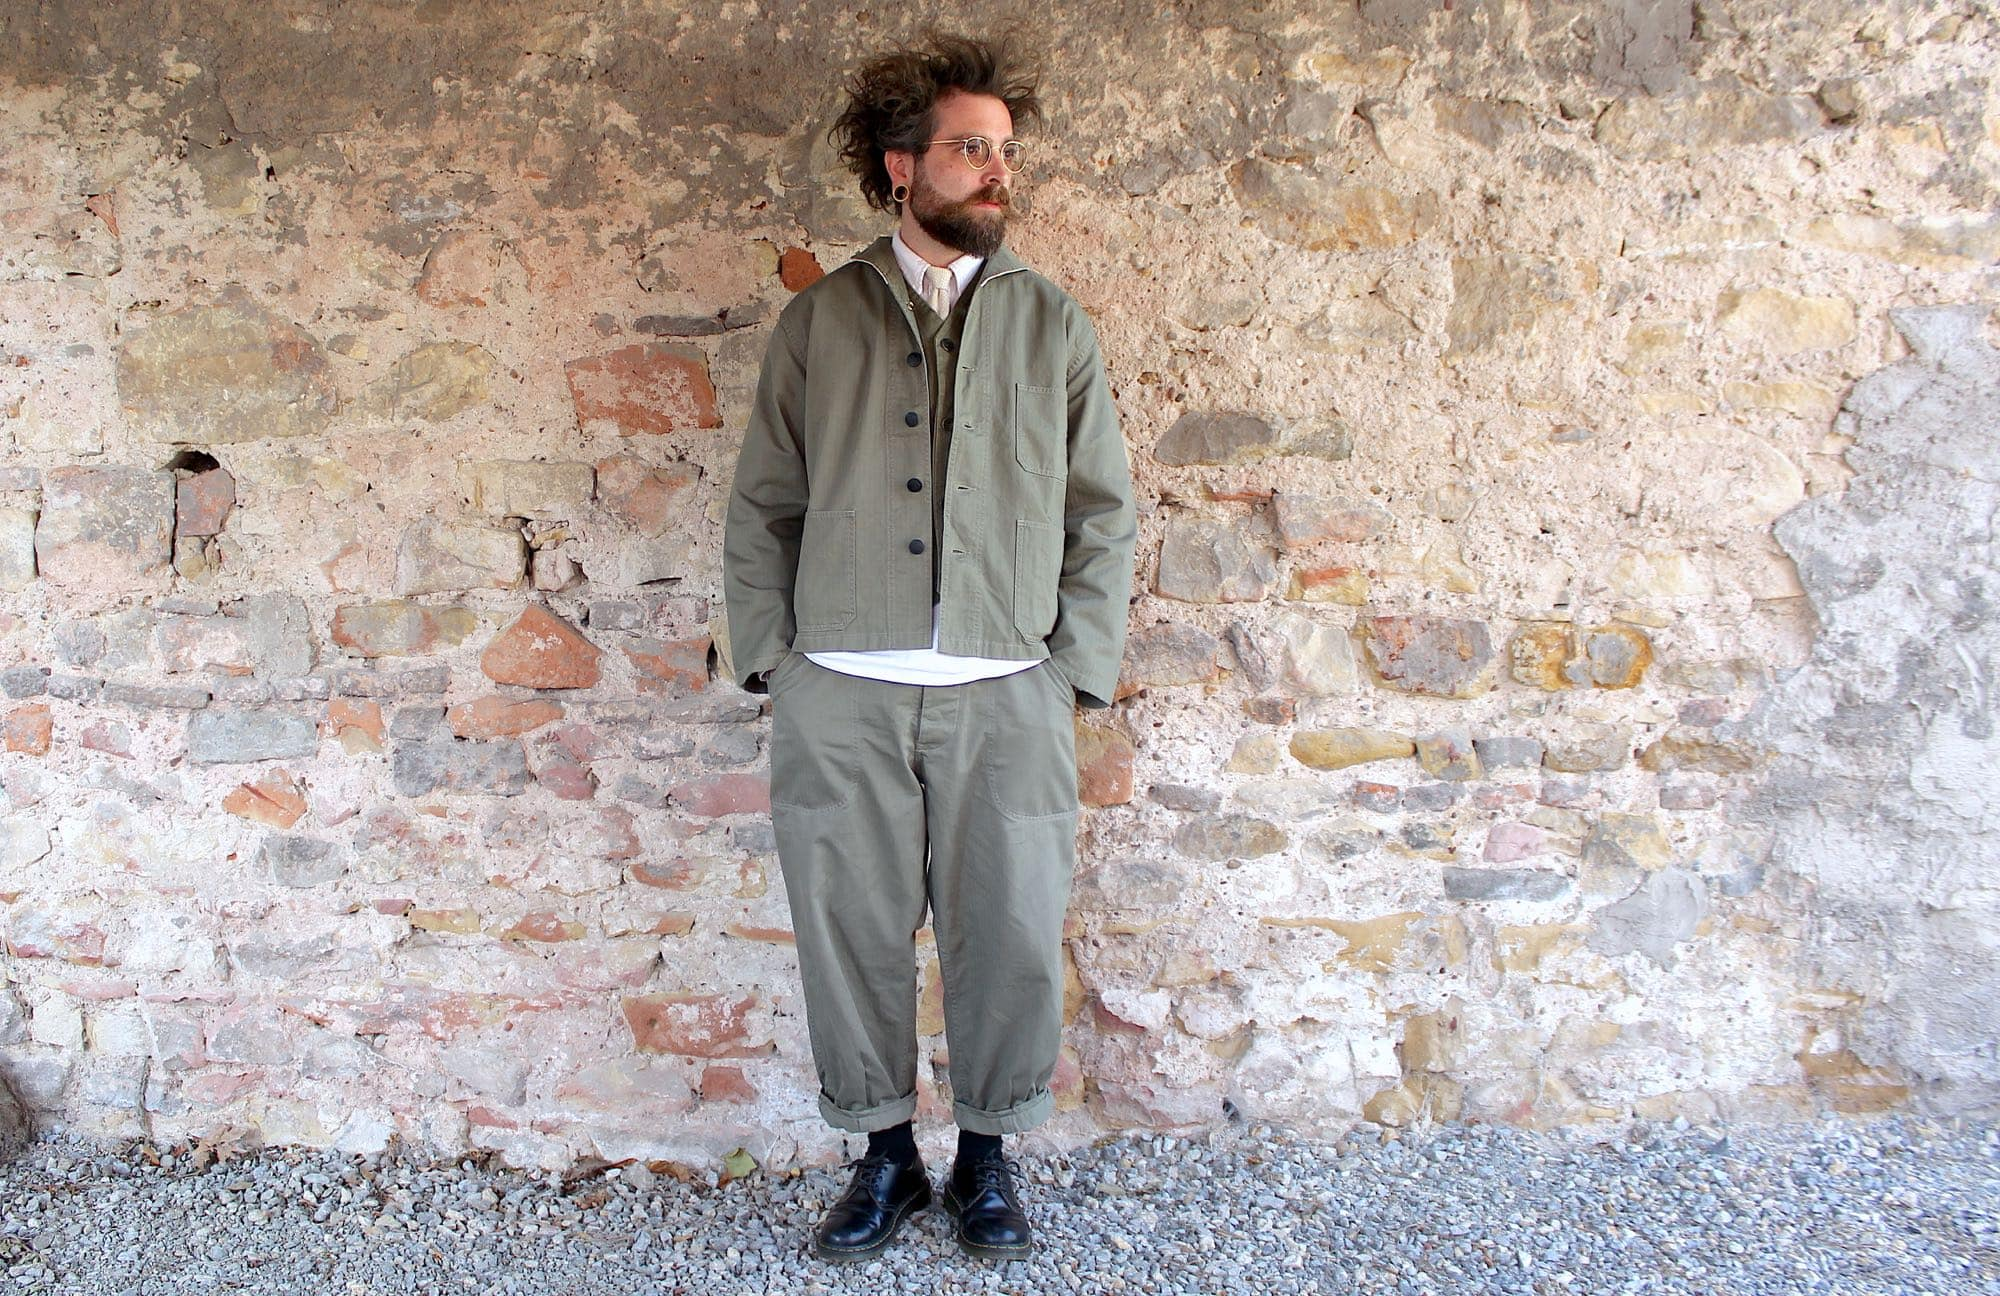 Arashi denim - marque workwear militaria - veste et pantalon HBT